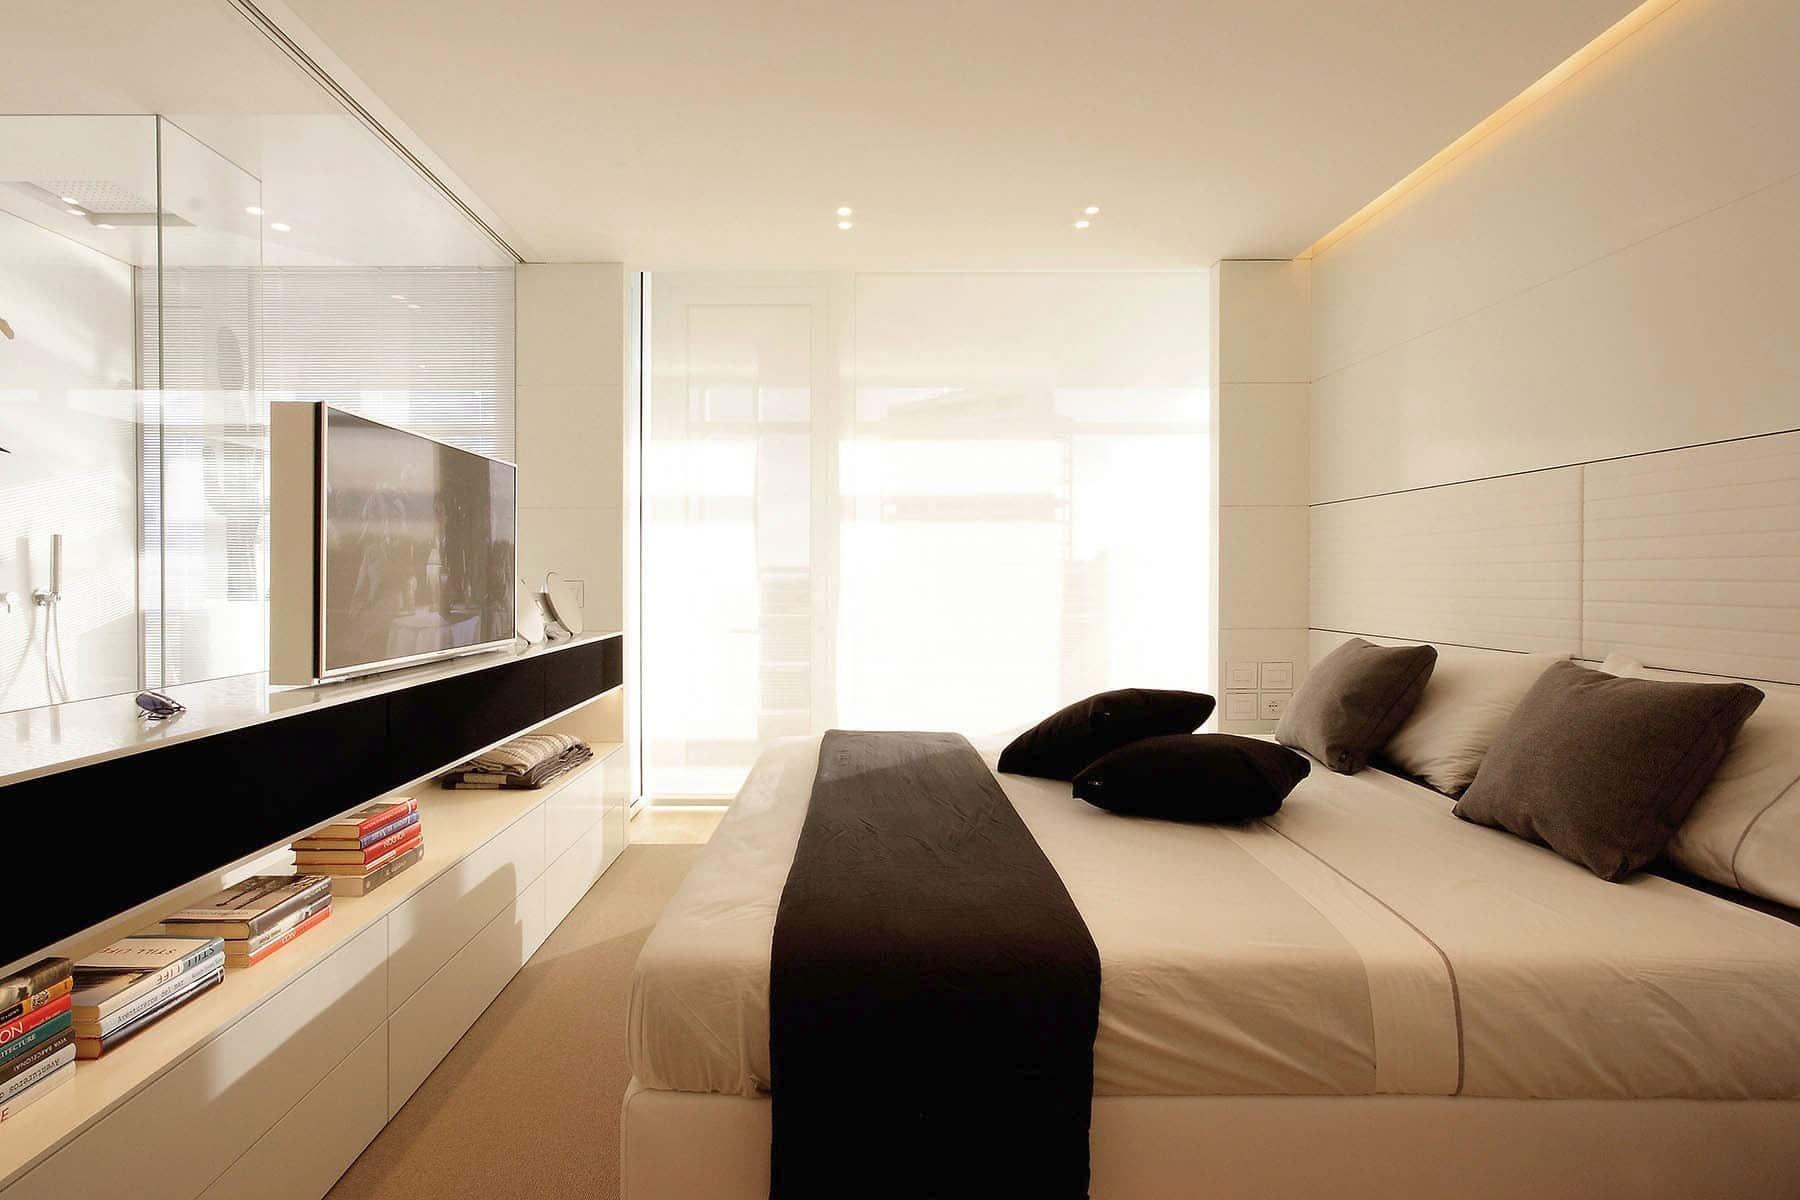 Plano departamento peque o dos dormitorios construye hogar - Dormitorios blancos modernos ...